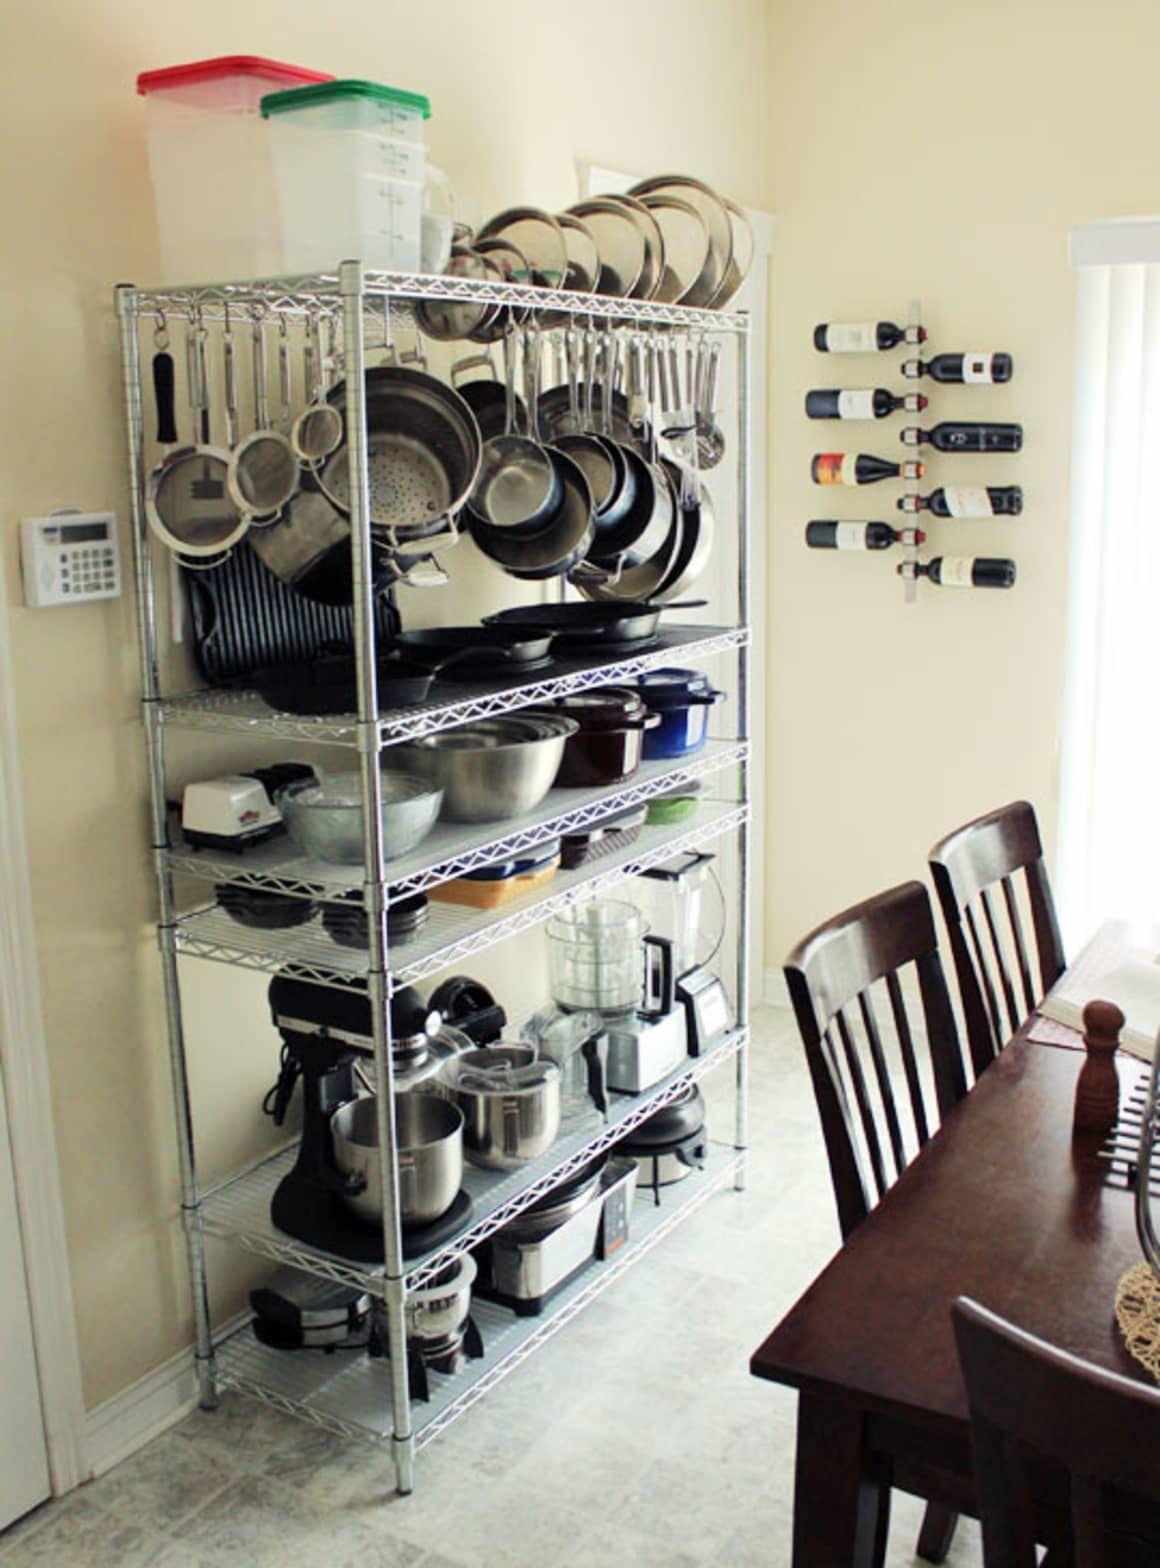 3 Pull Out Kitchen Storage Basket Rack Kitchen Wire Mesh Cabinet Organiser 600mm 5055986107163 Ebay Pull Out Kitchen Storage Kitchen Baskets Cupboard Storage